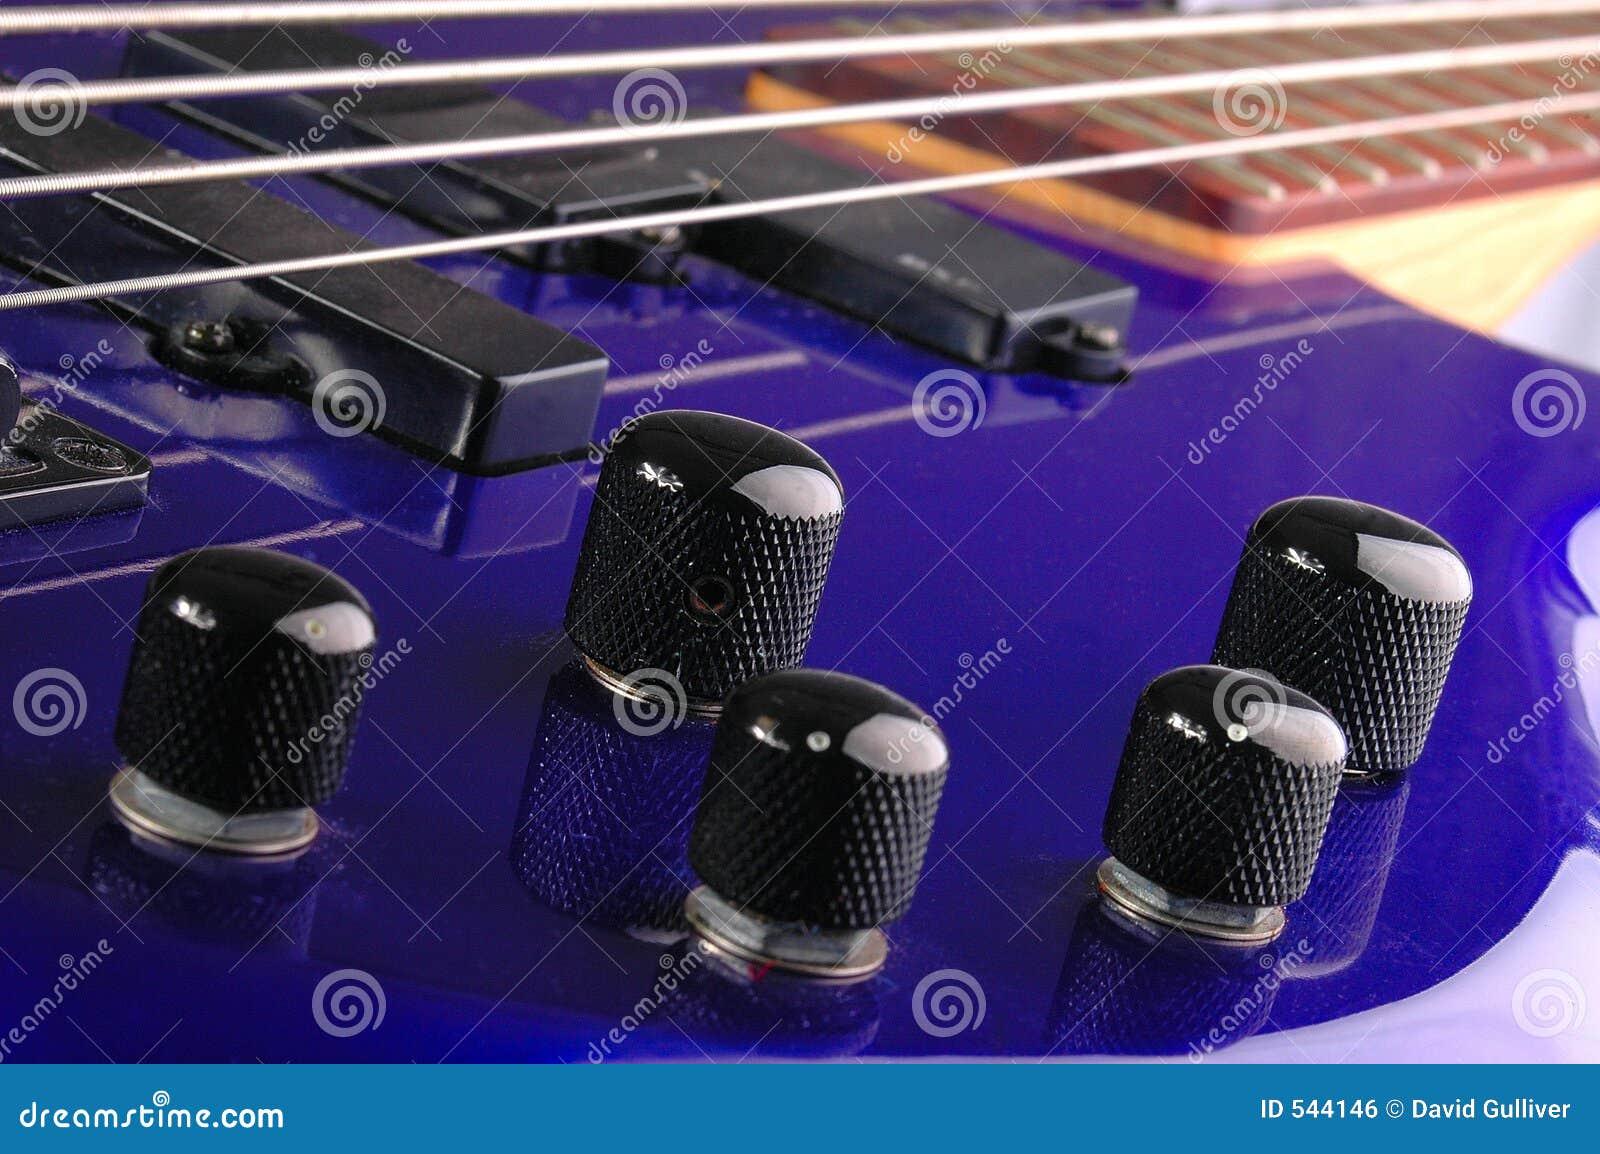 Download 瘤 库存照片. 图片 包括有 音乐, 紫罗兰色, 岩石, 商业, 数量, bambi, 紫色, 虚拟, 大声 - 544146